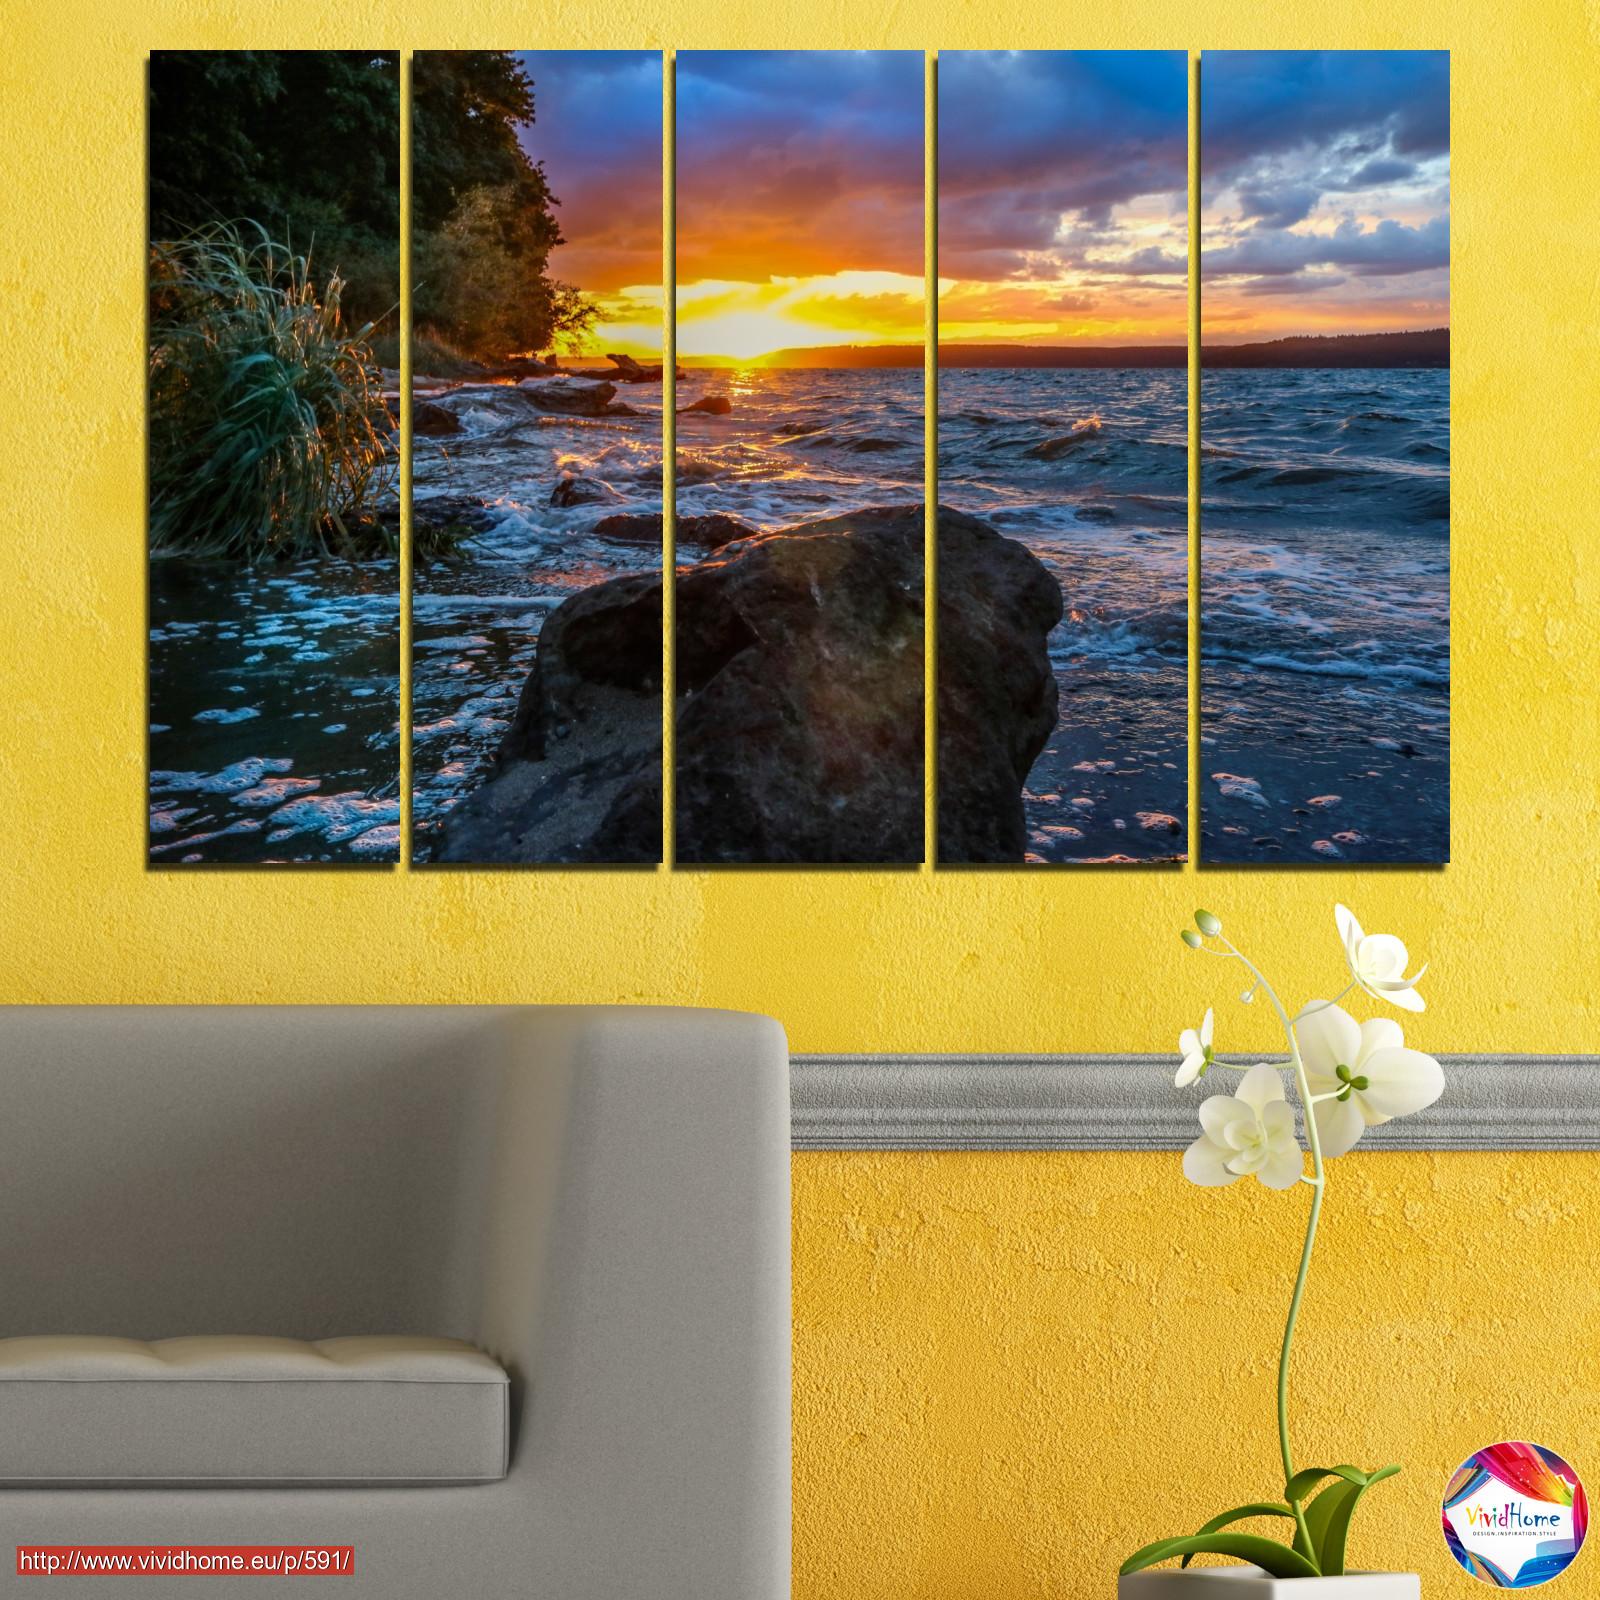 Landscape, Nature, Sea, Sunset, Bay, Rocks №0591